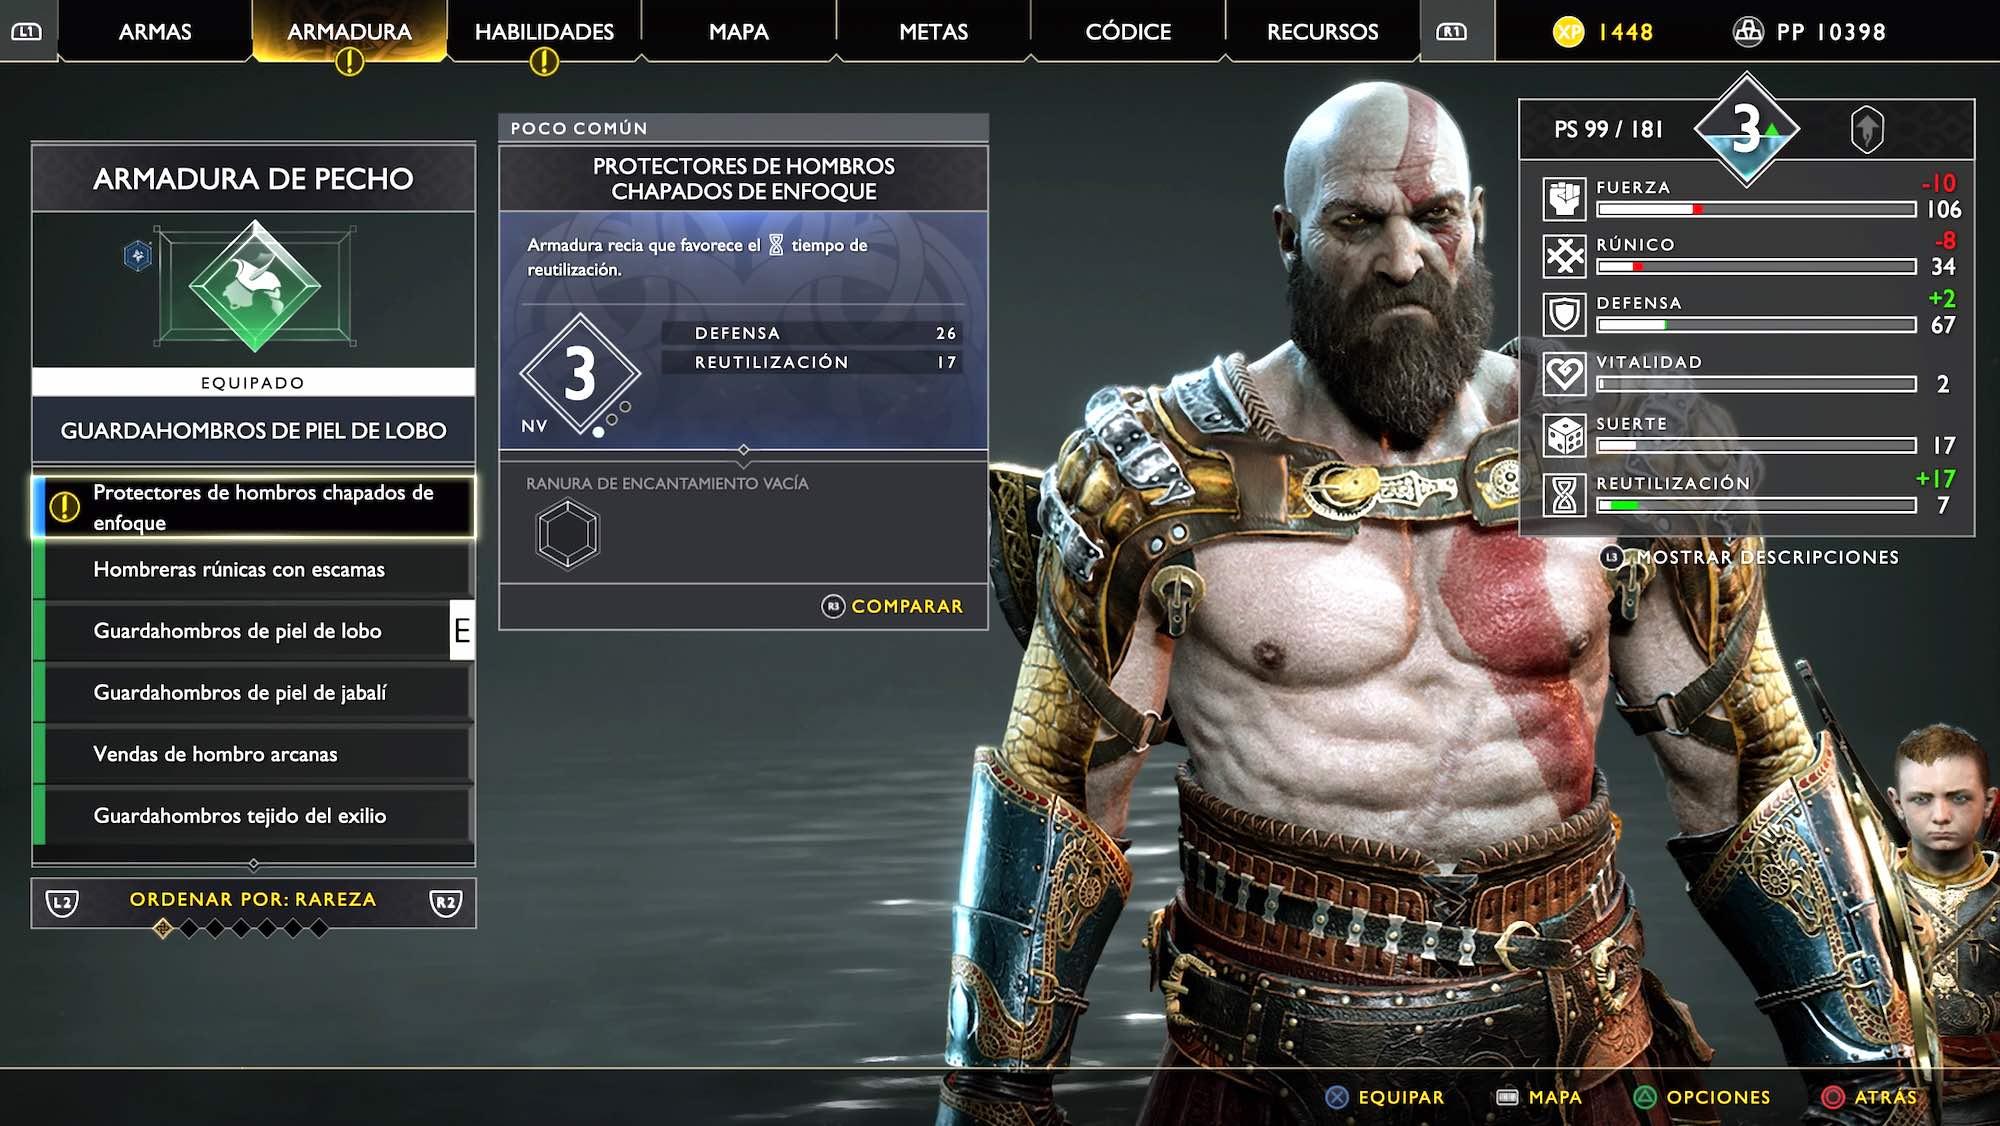 God-of-War-armadura